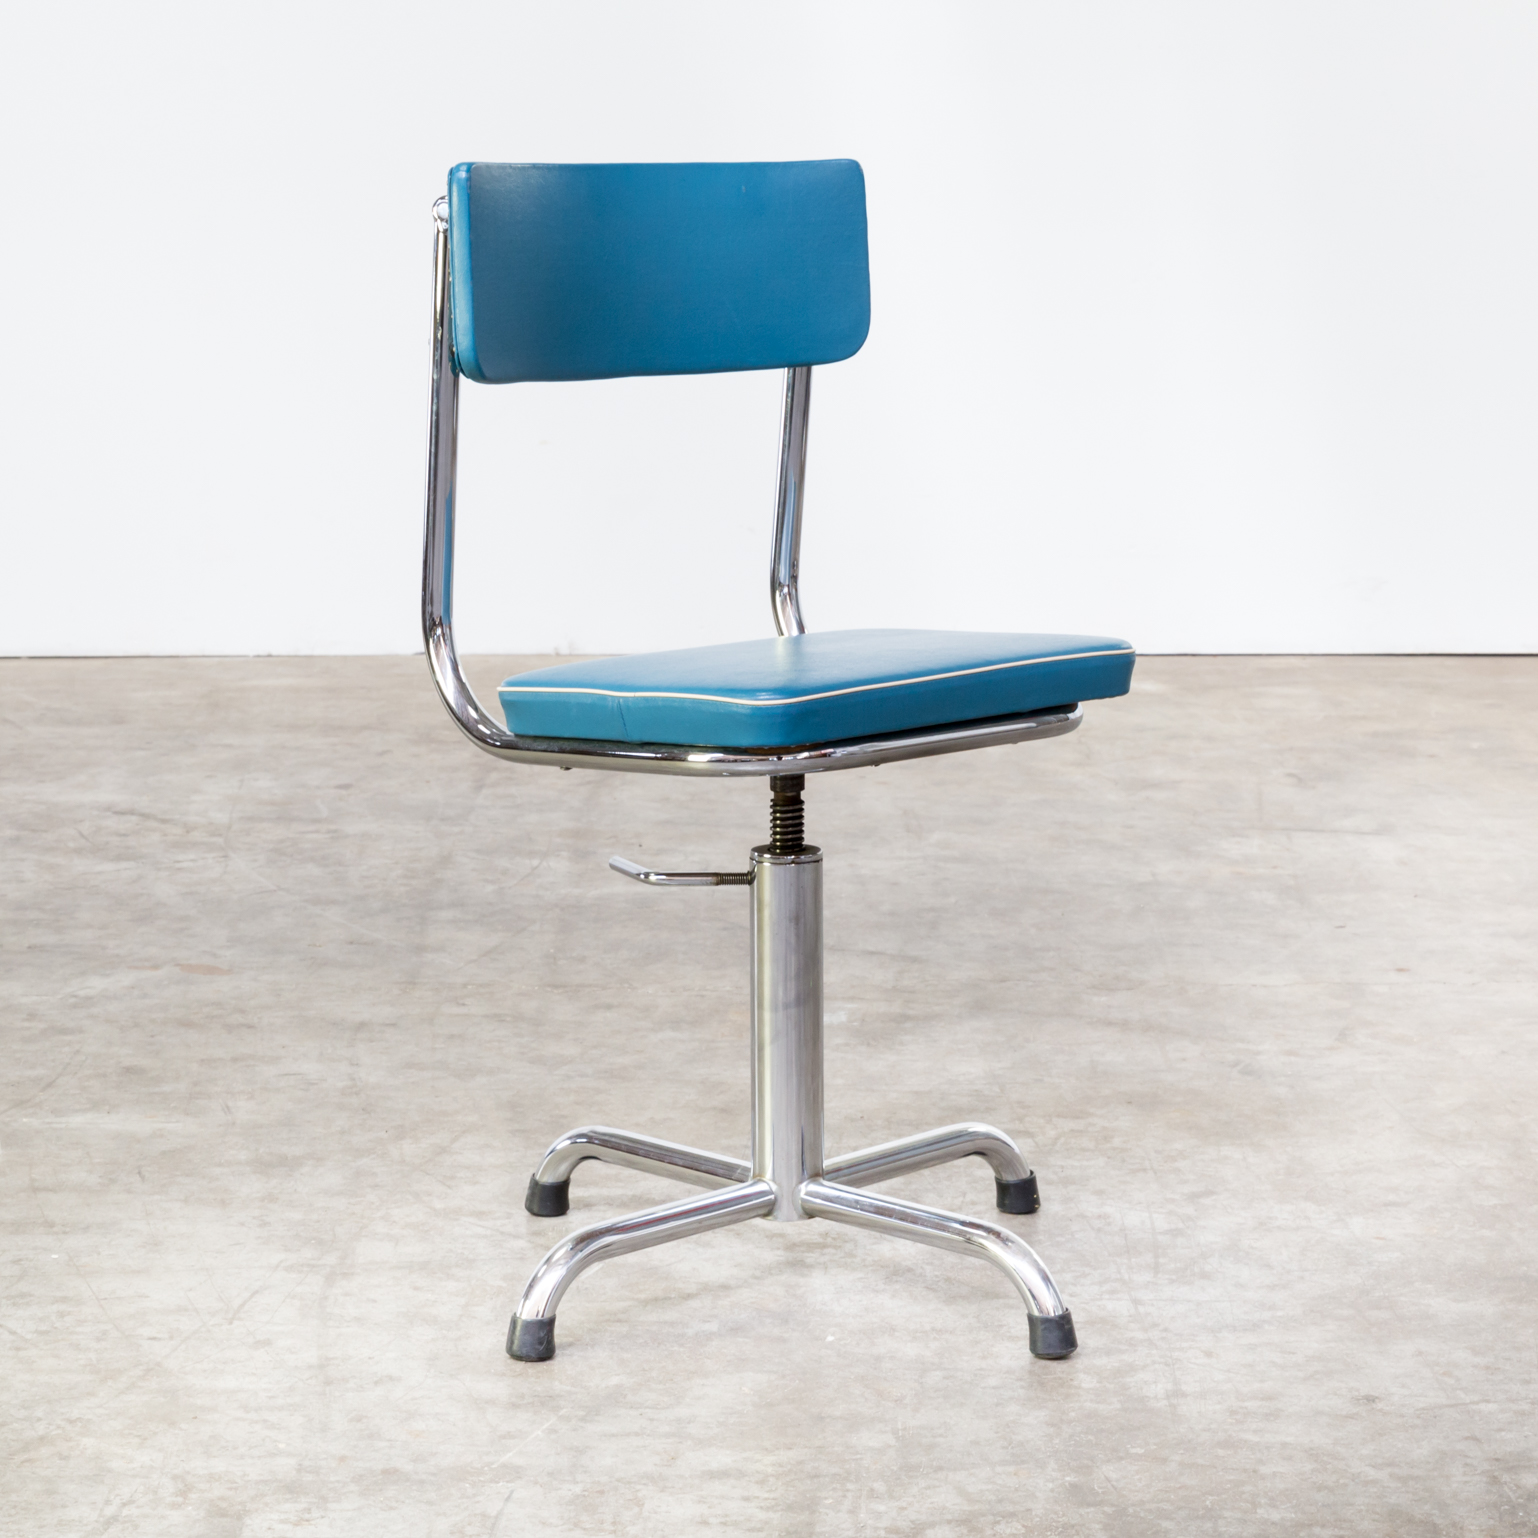 0814067zst Office Chair Desk Small Blue Trim Vintage